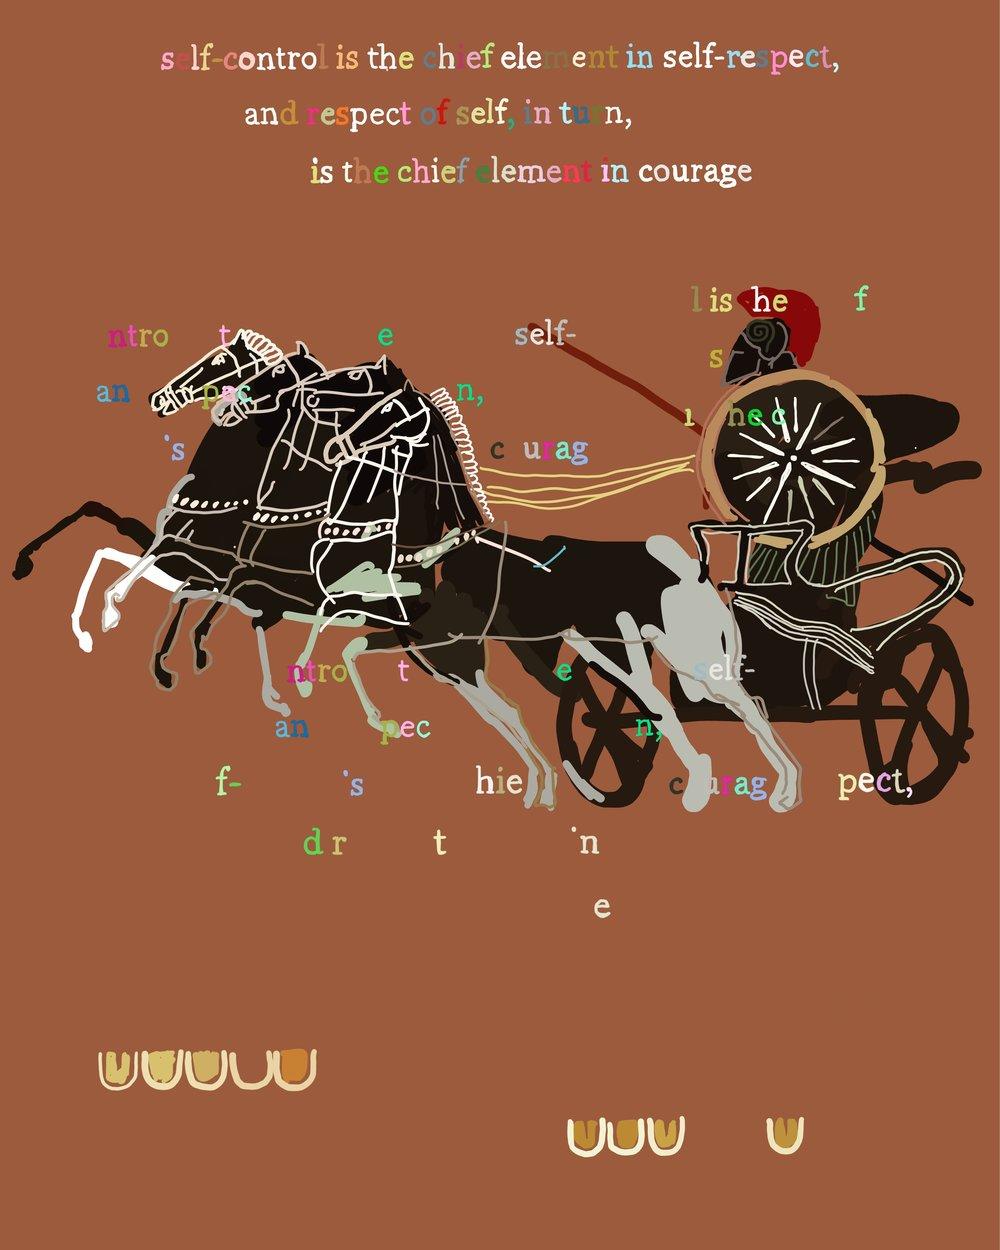 The Peloponnesian War, Book 1.84, The Debate at Sparta, iPhone X, digital image.